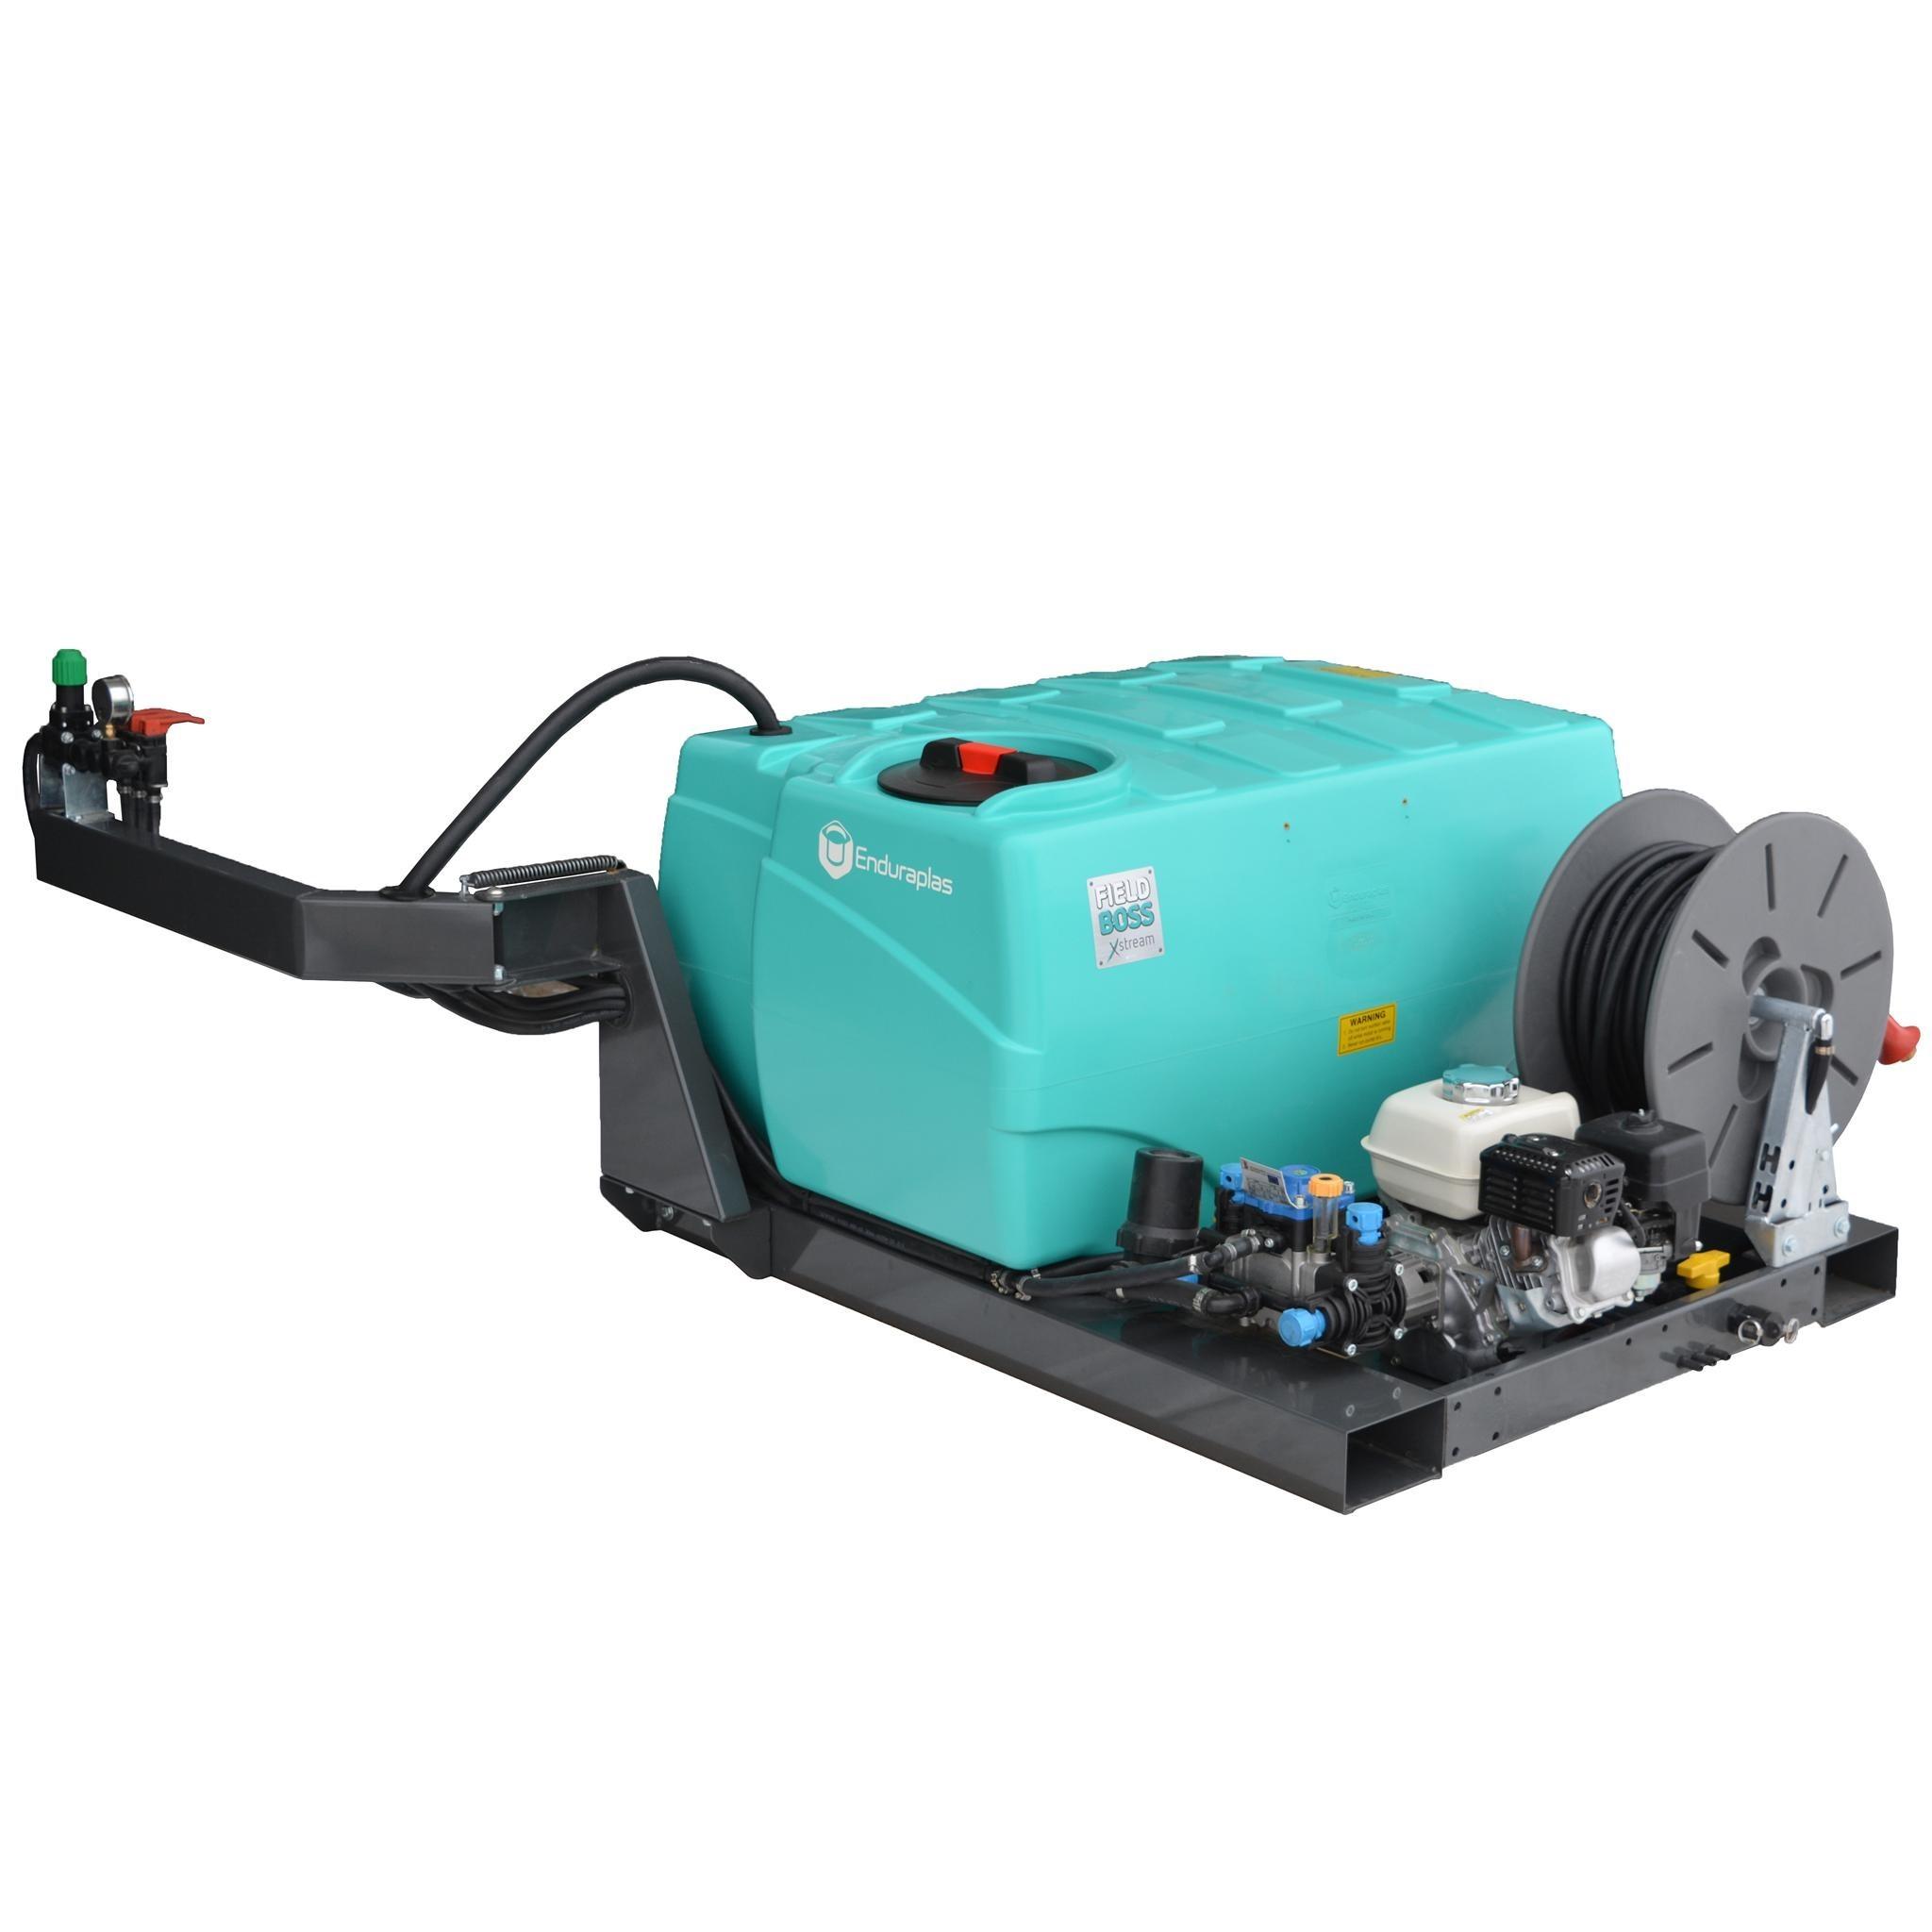 Enduraplas SFB100FG290EX Pull-Type Sprayer